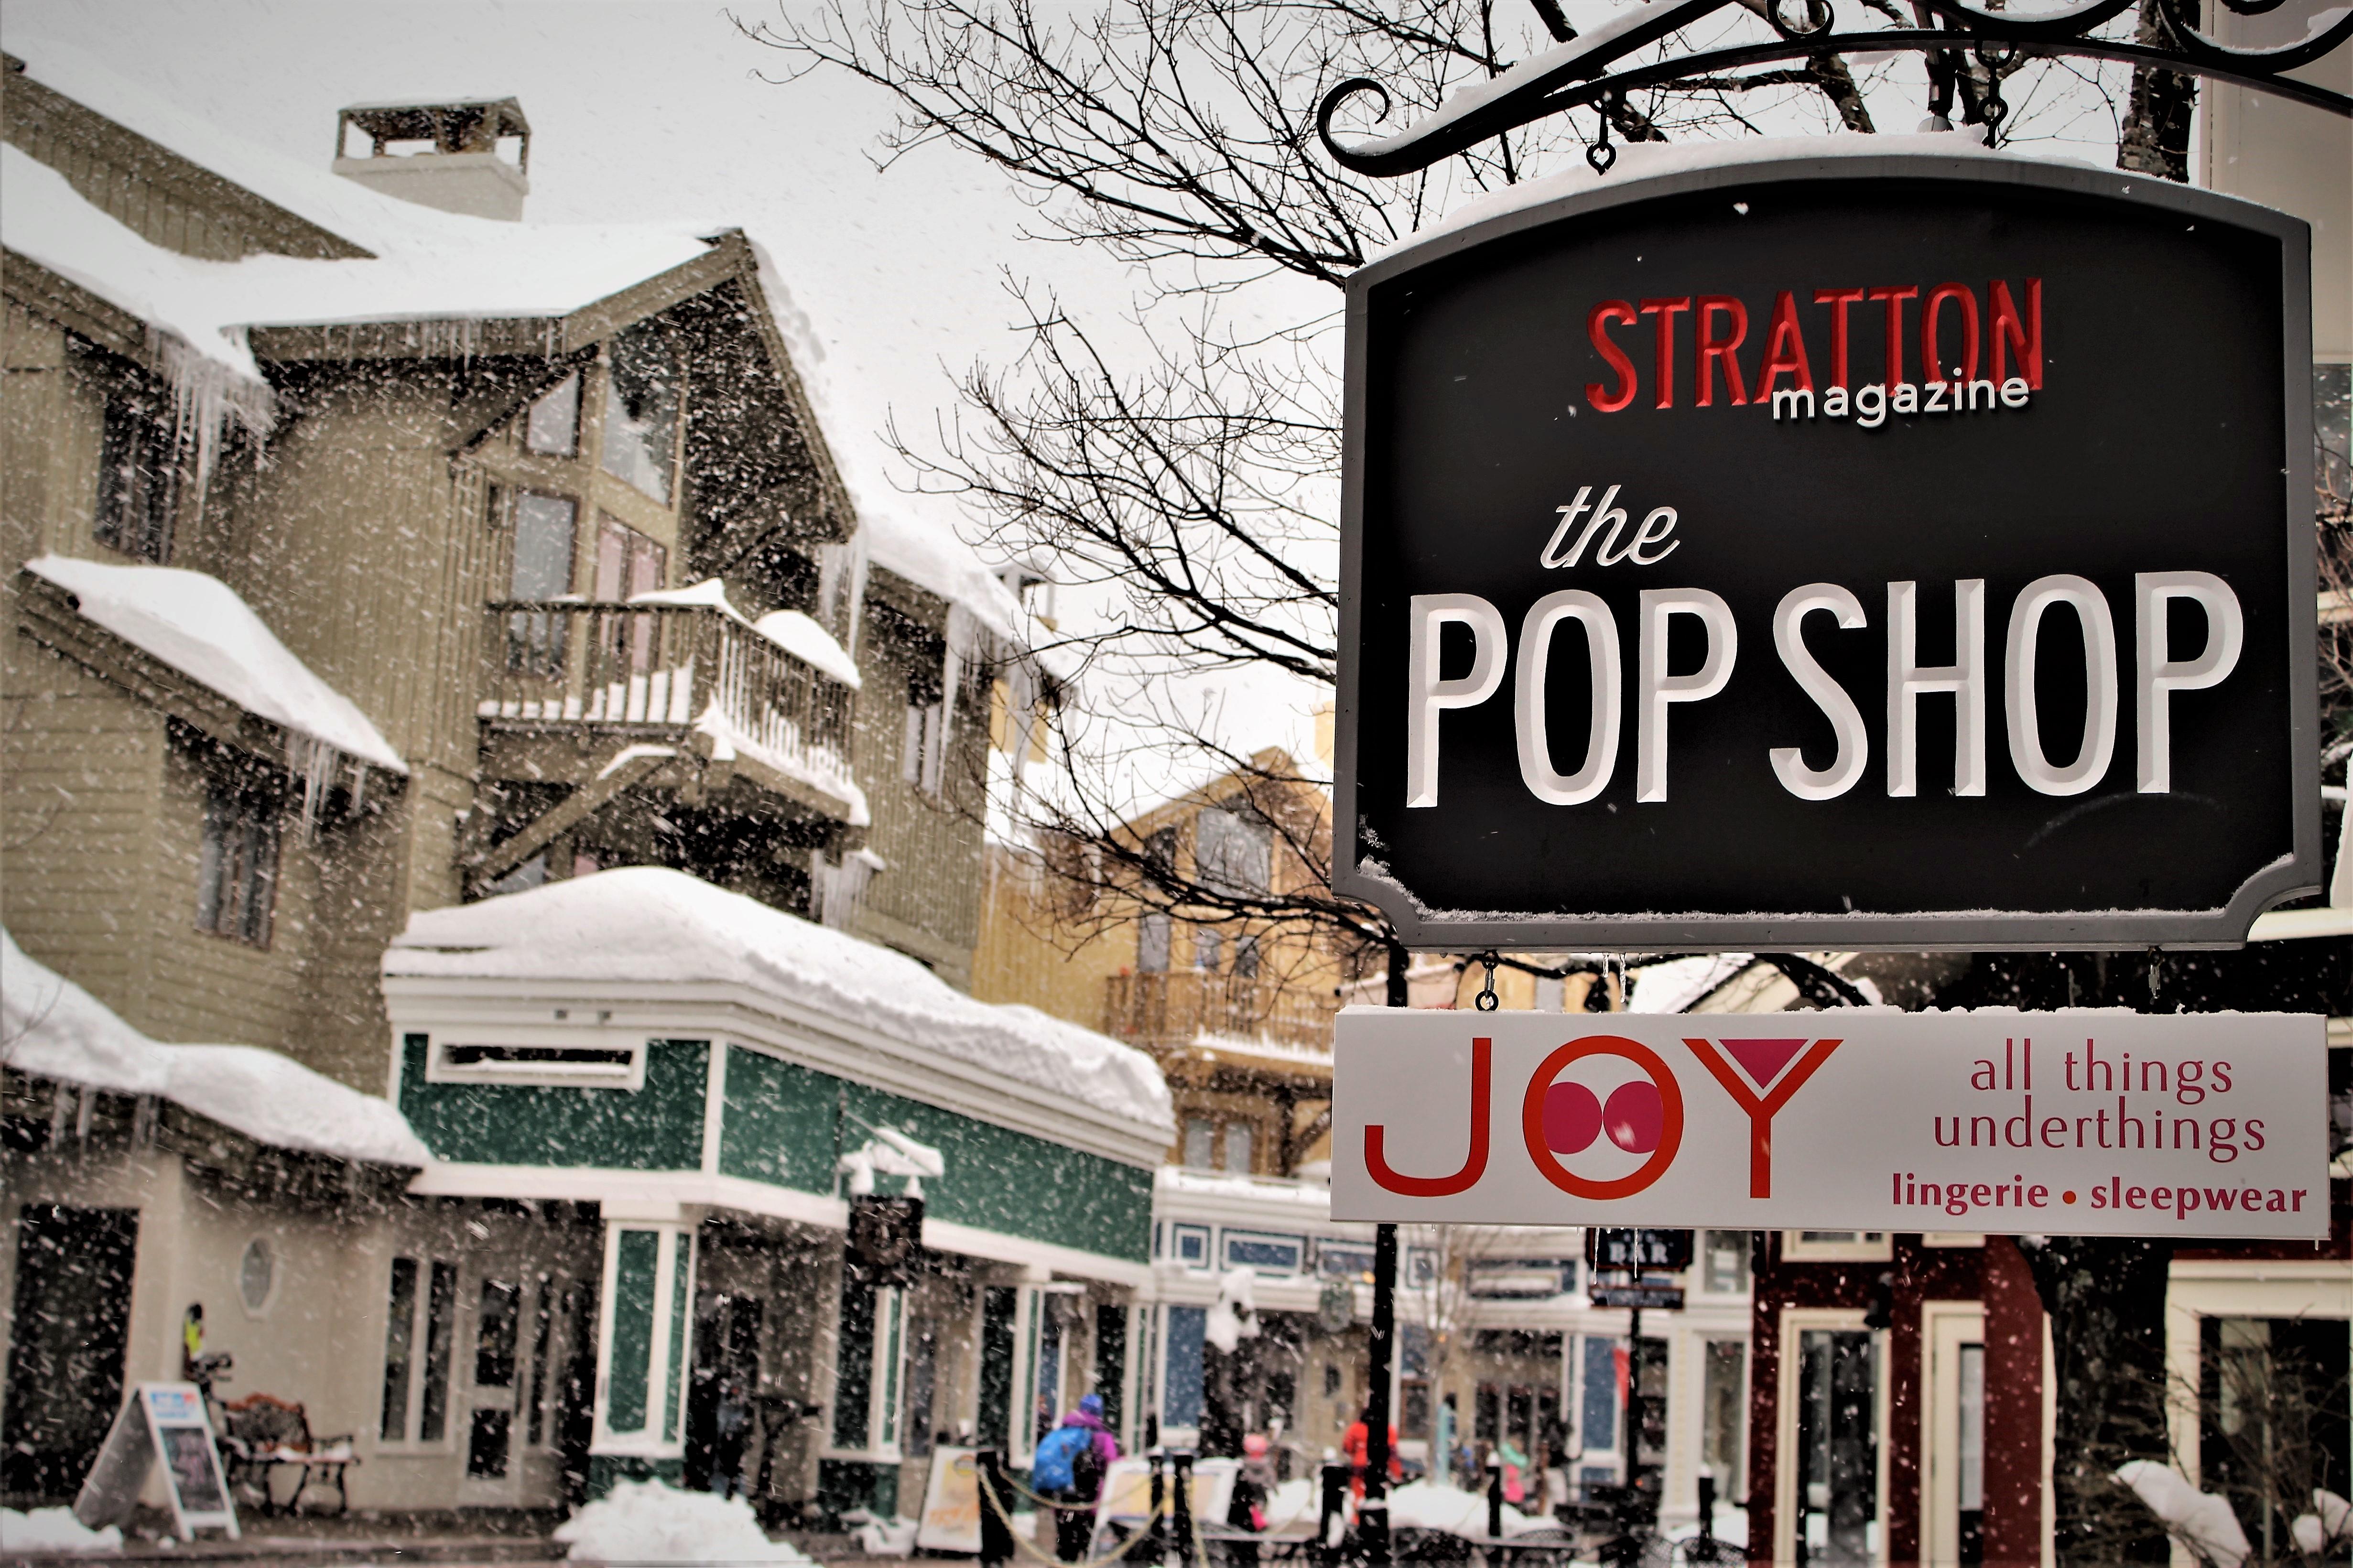 joy pop shop stratton